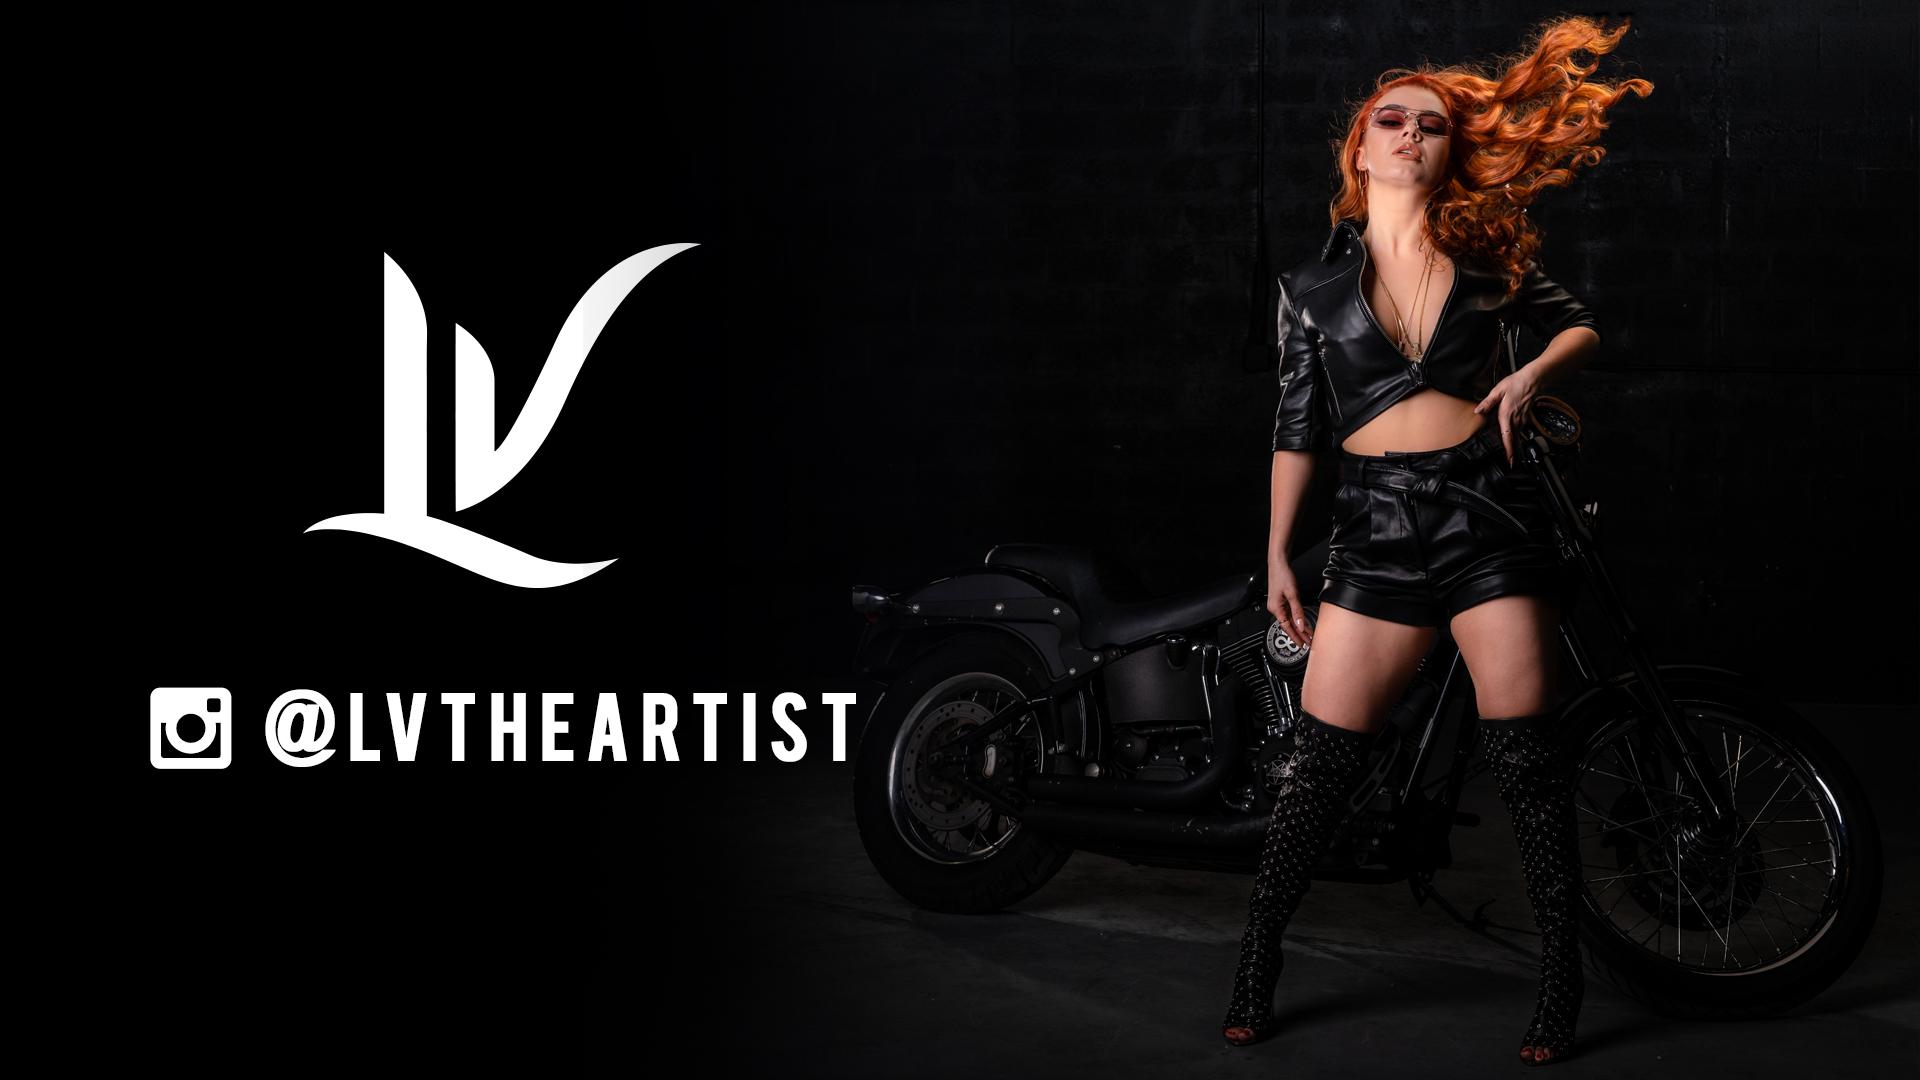 lvtheartist-IG-motorcycle-Lobby.jpg